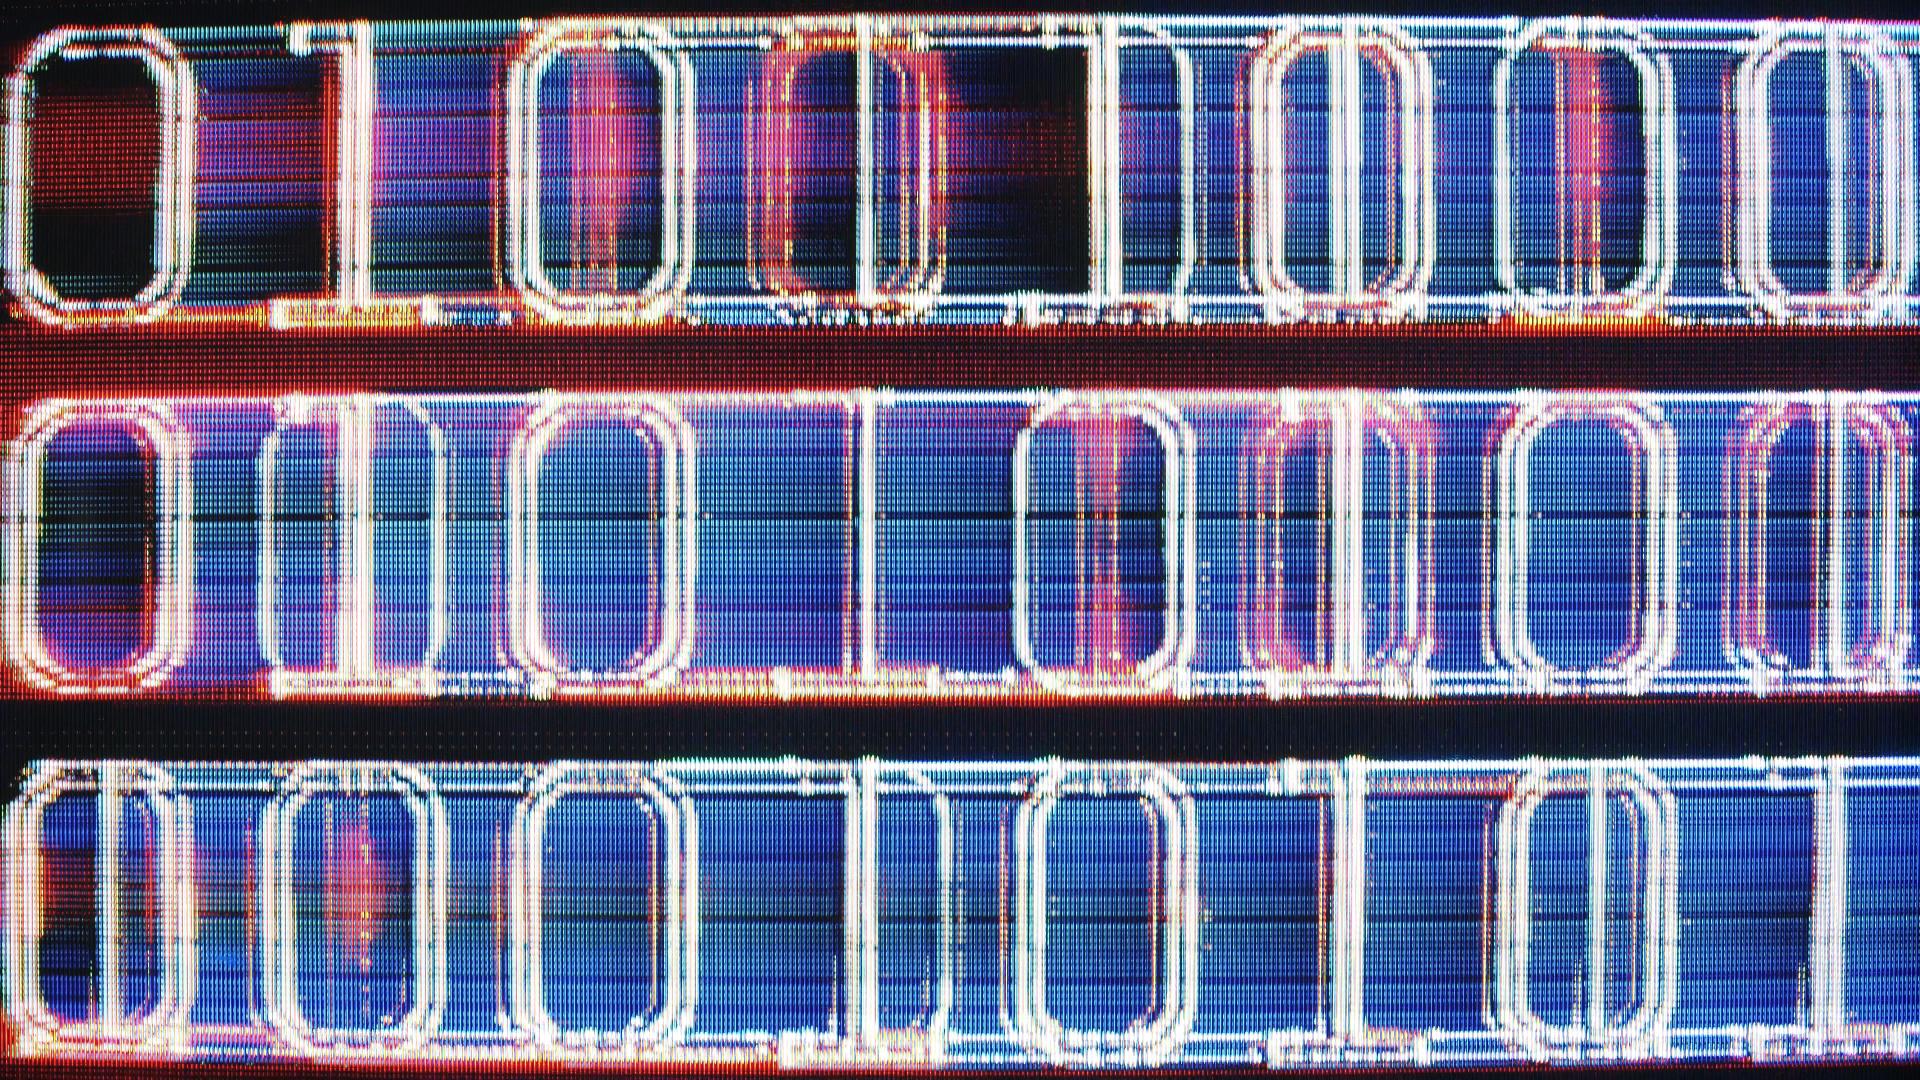 Martin Garrix ANIMA Tour Visuals by Peter Clark